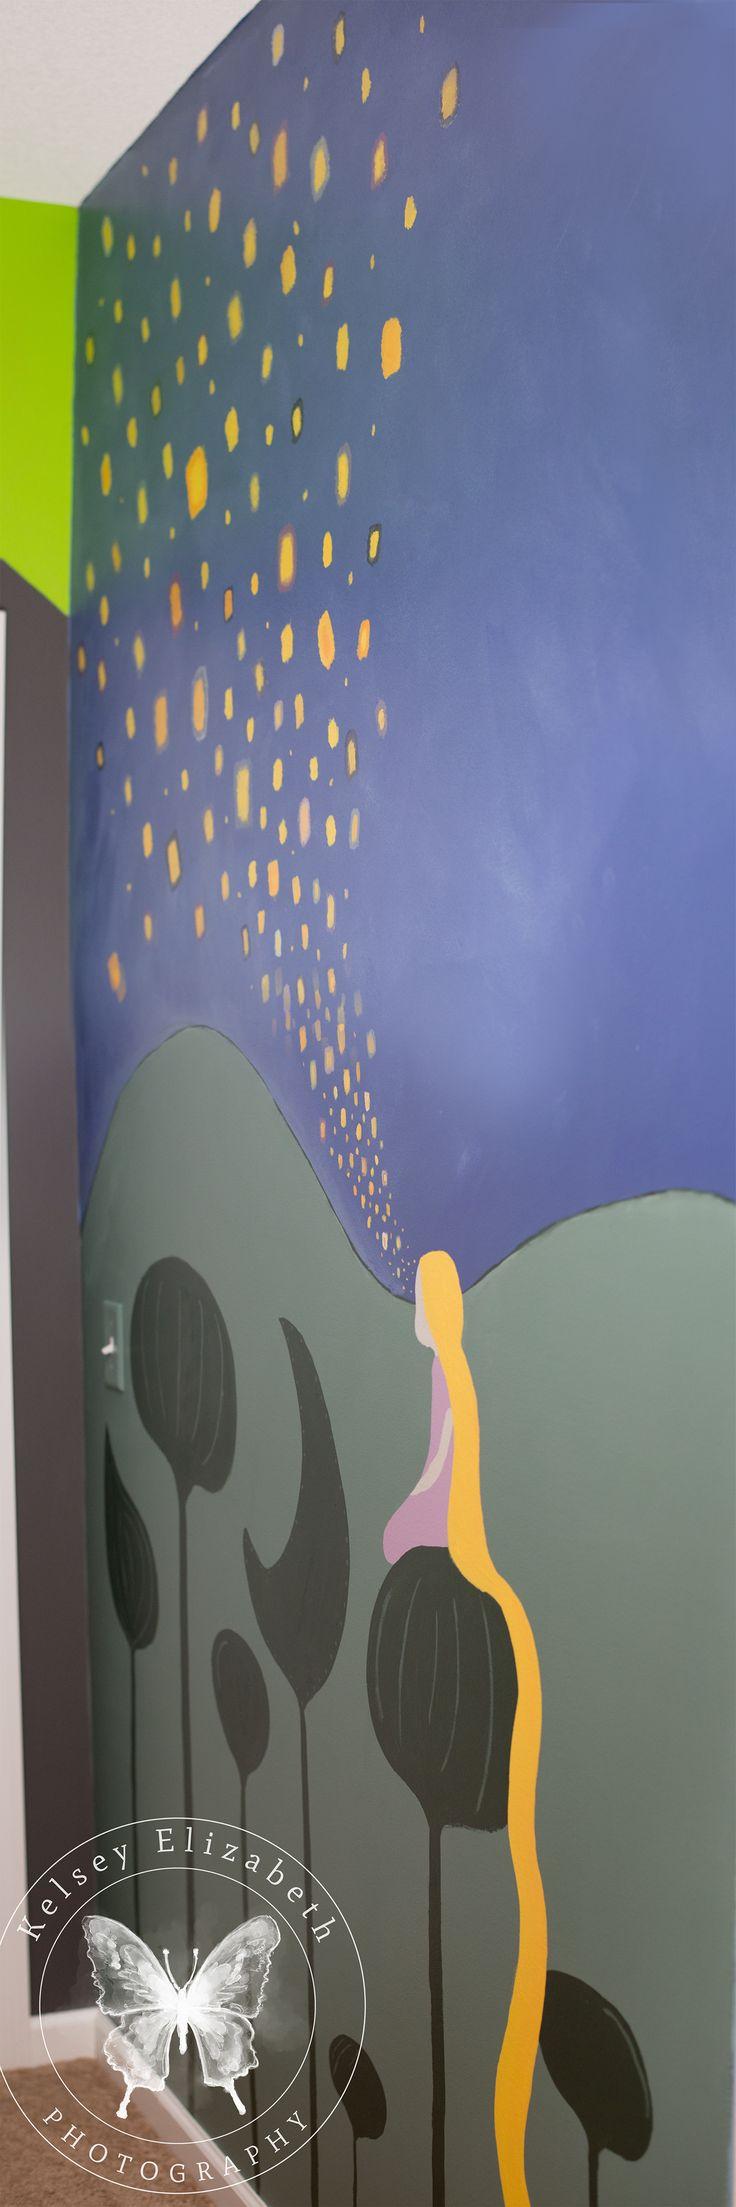 Best 25+ Tangled room ideas on Pinterest   Rapunzel room ...